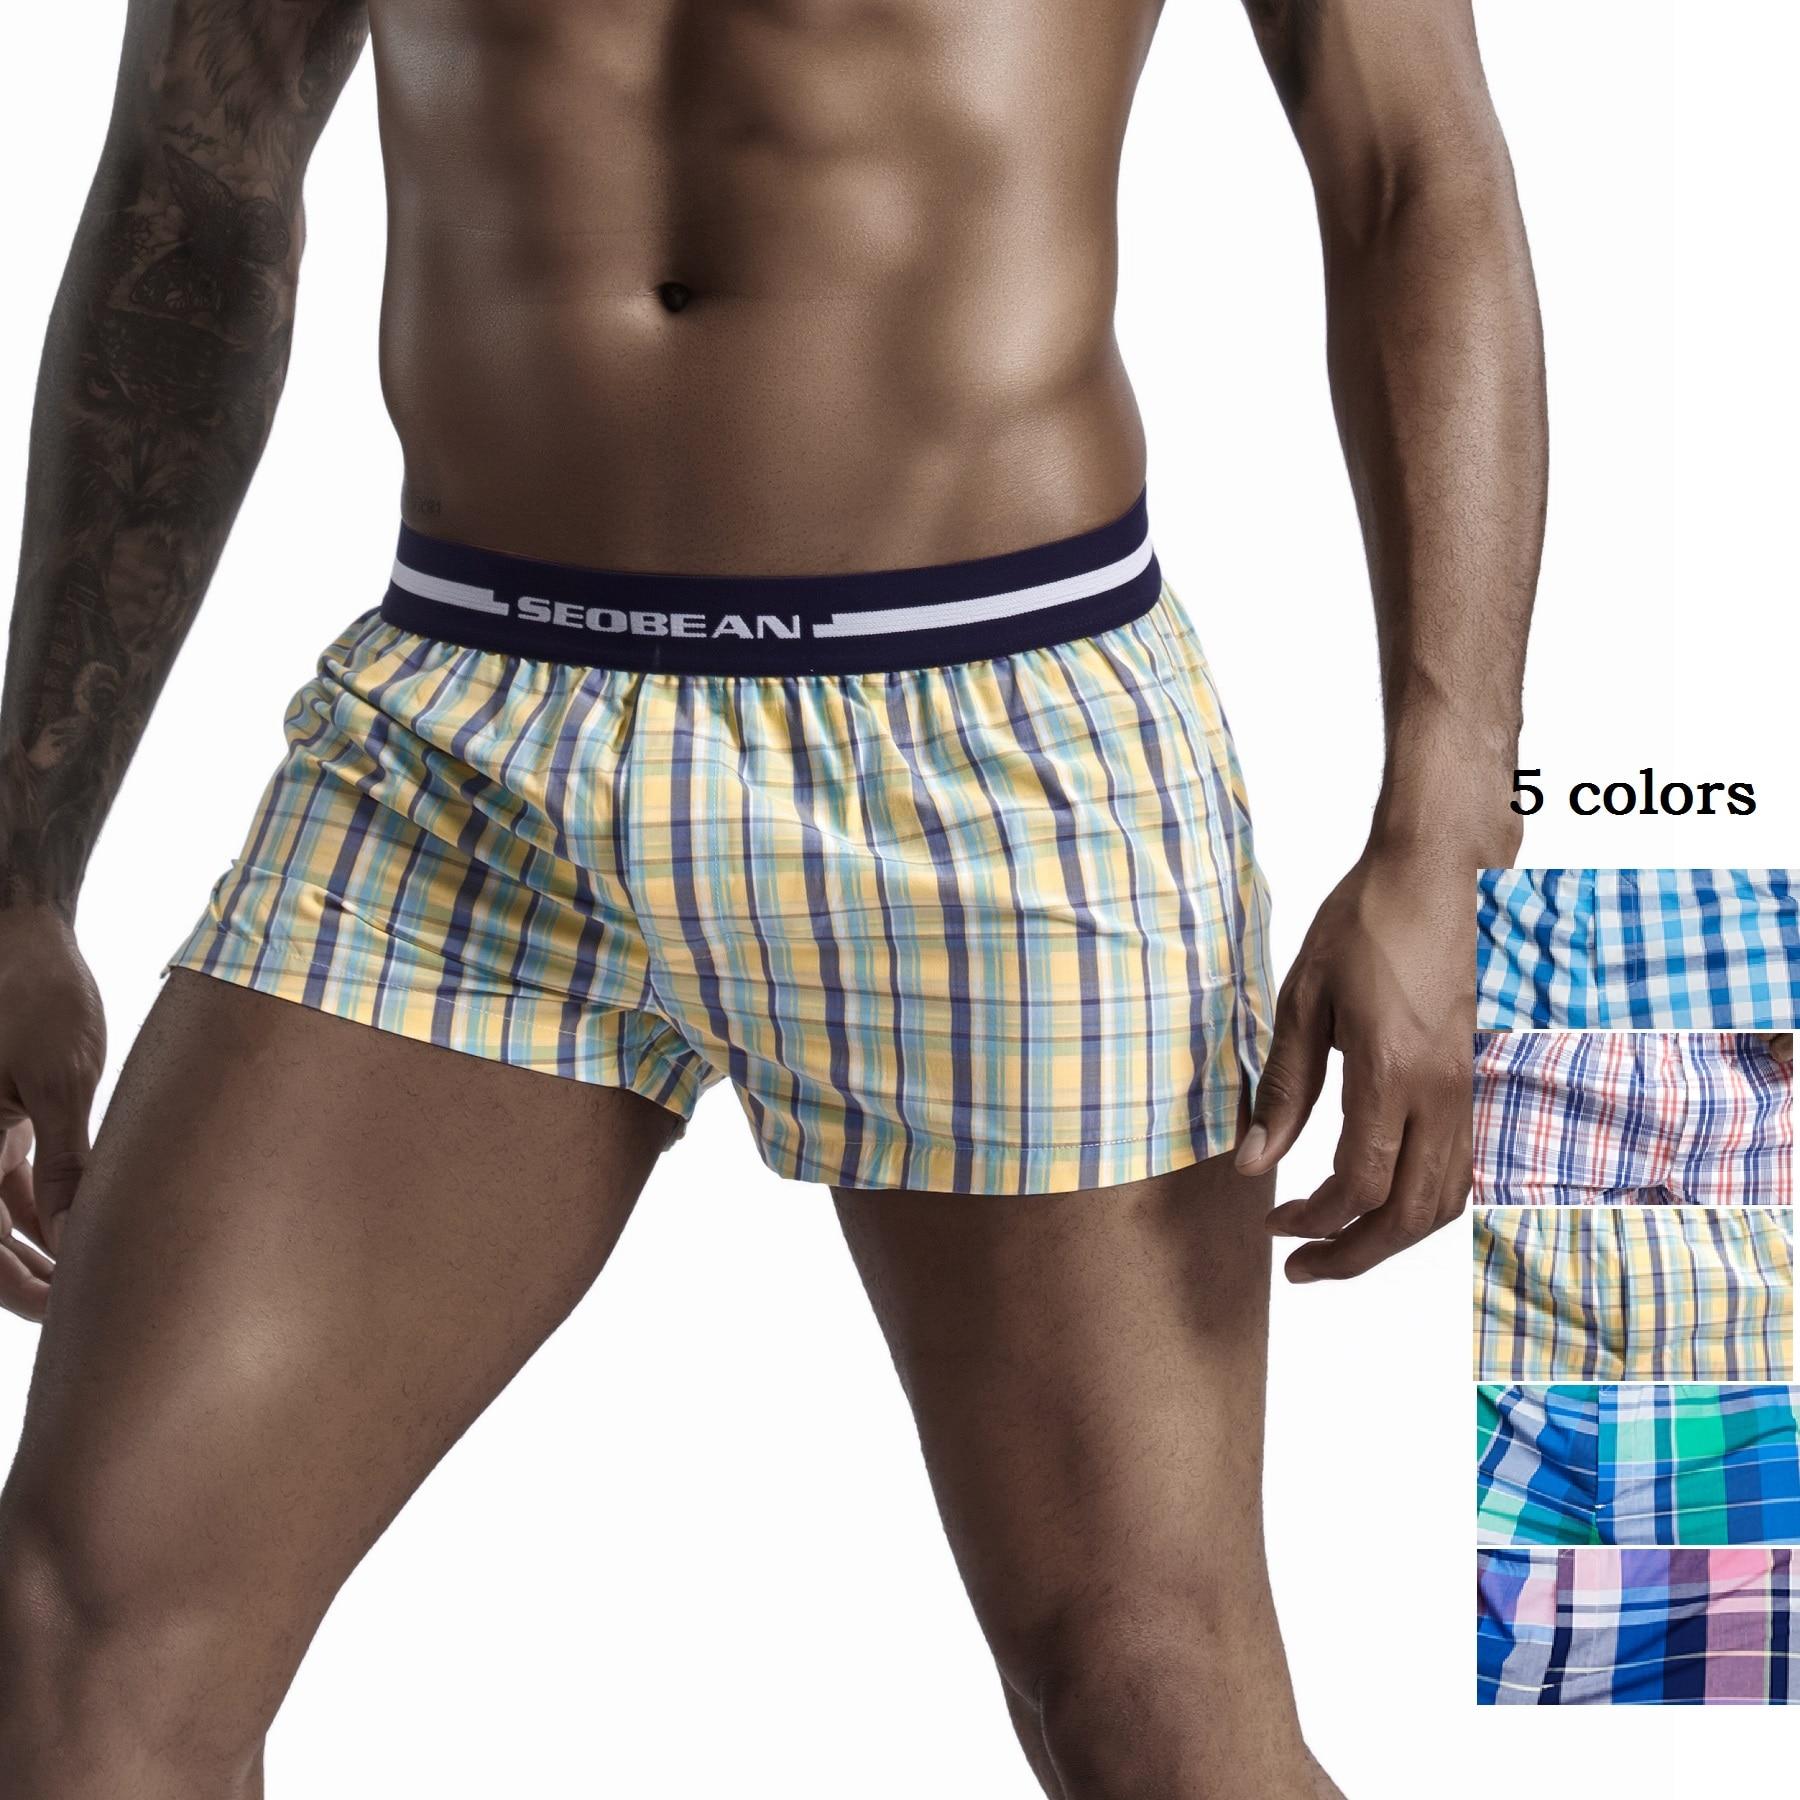 SEOBEAN Front Open Men Cotton Pajama Boxer Shorts U Bag Lined Plaid Tracksuit Home Pyjama Man Sleep Casual Short Cortos Hombres